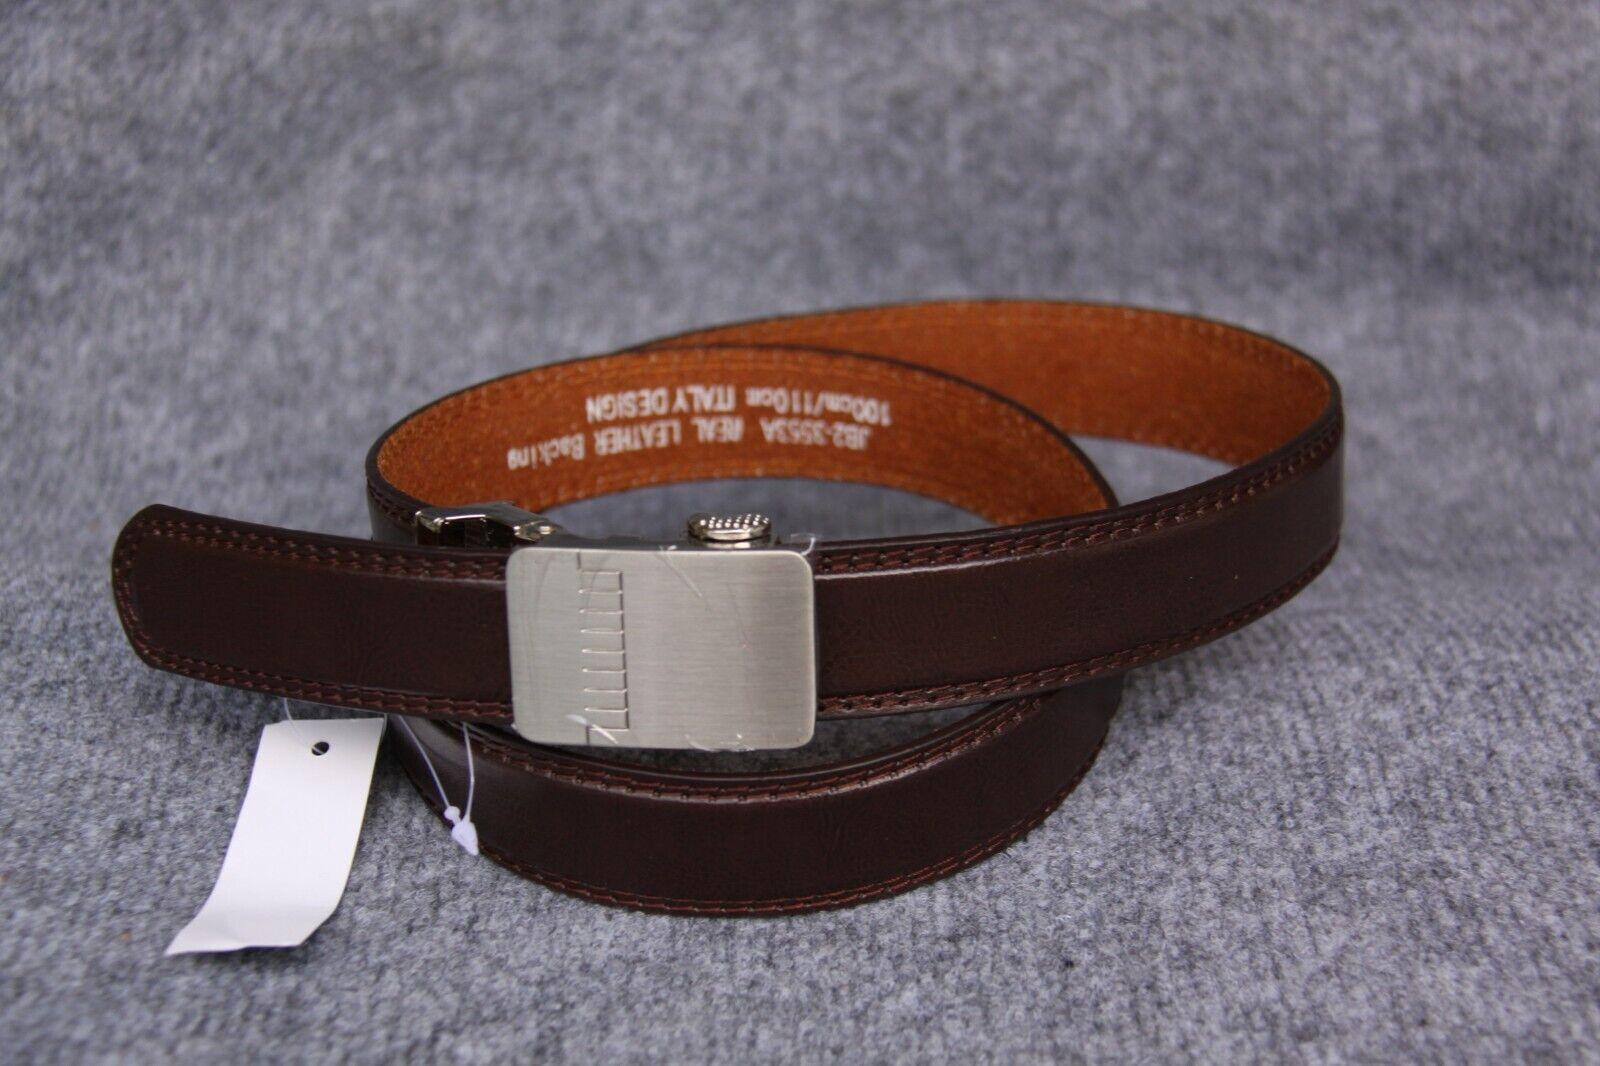 Classic Belt Brown Size 110 einschiebe schliese Silver Colors 16